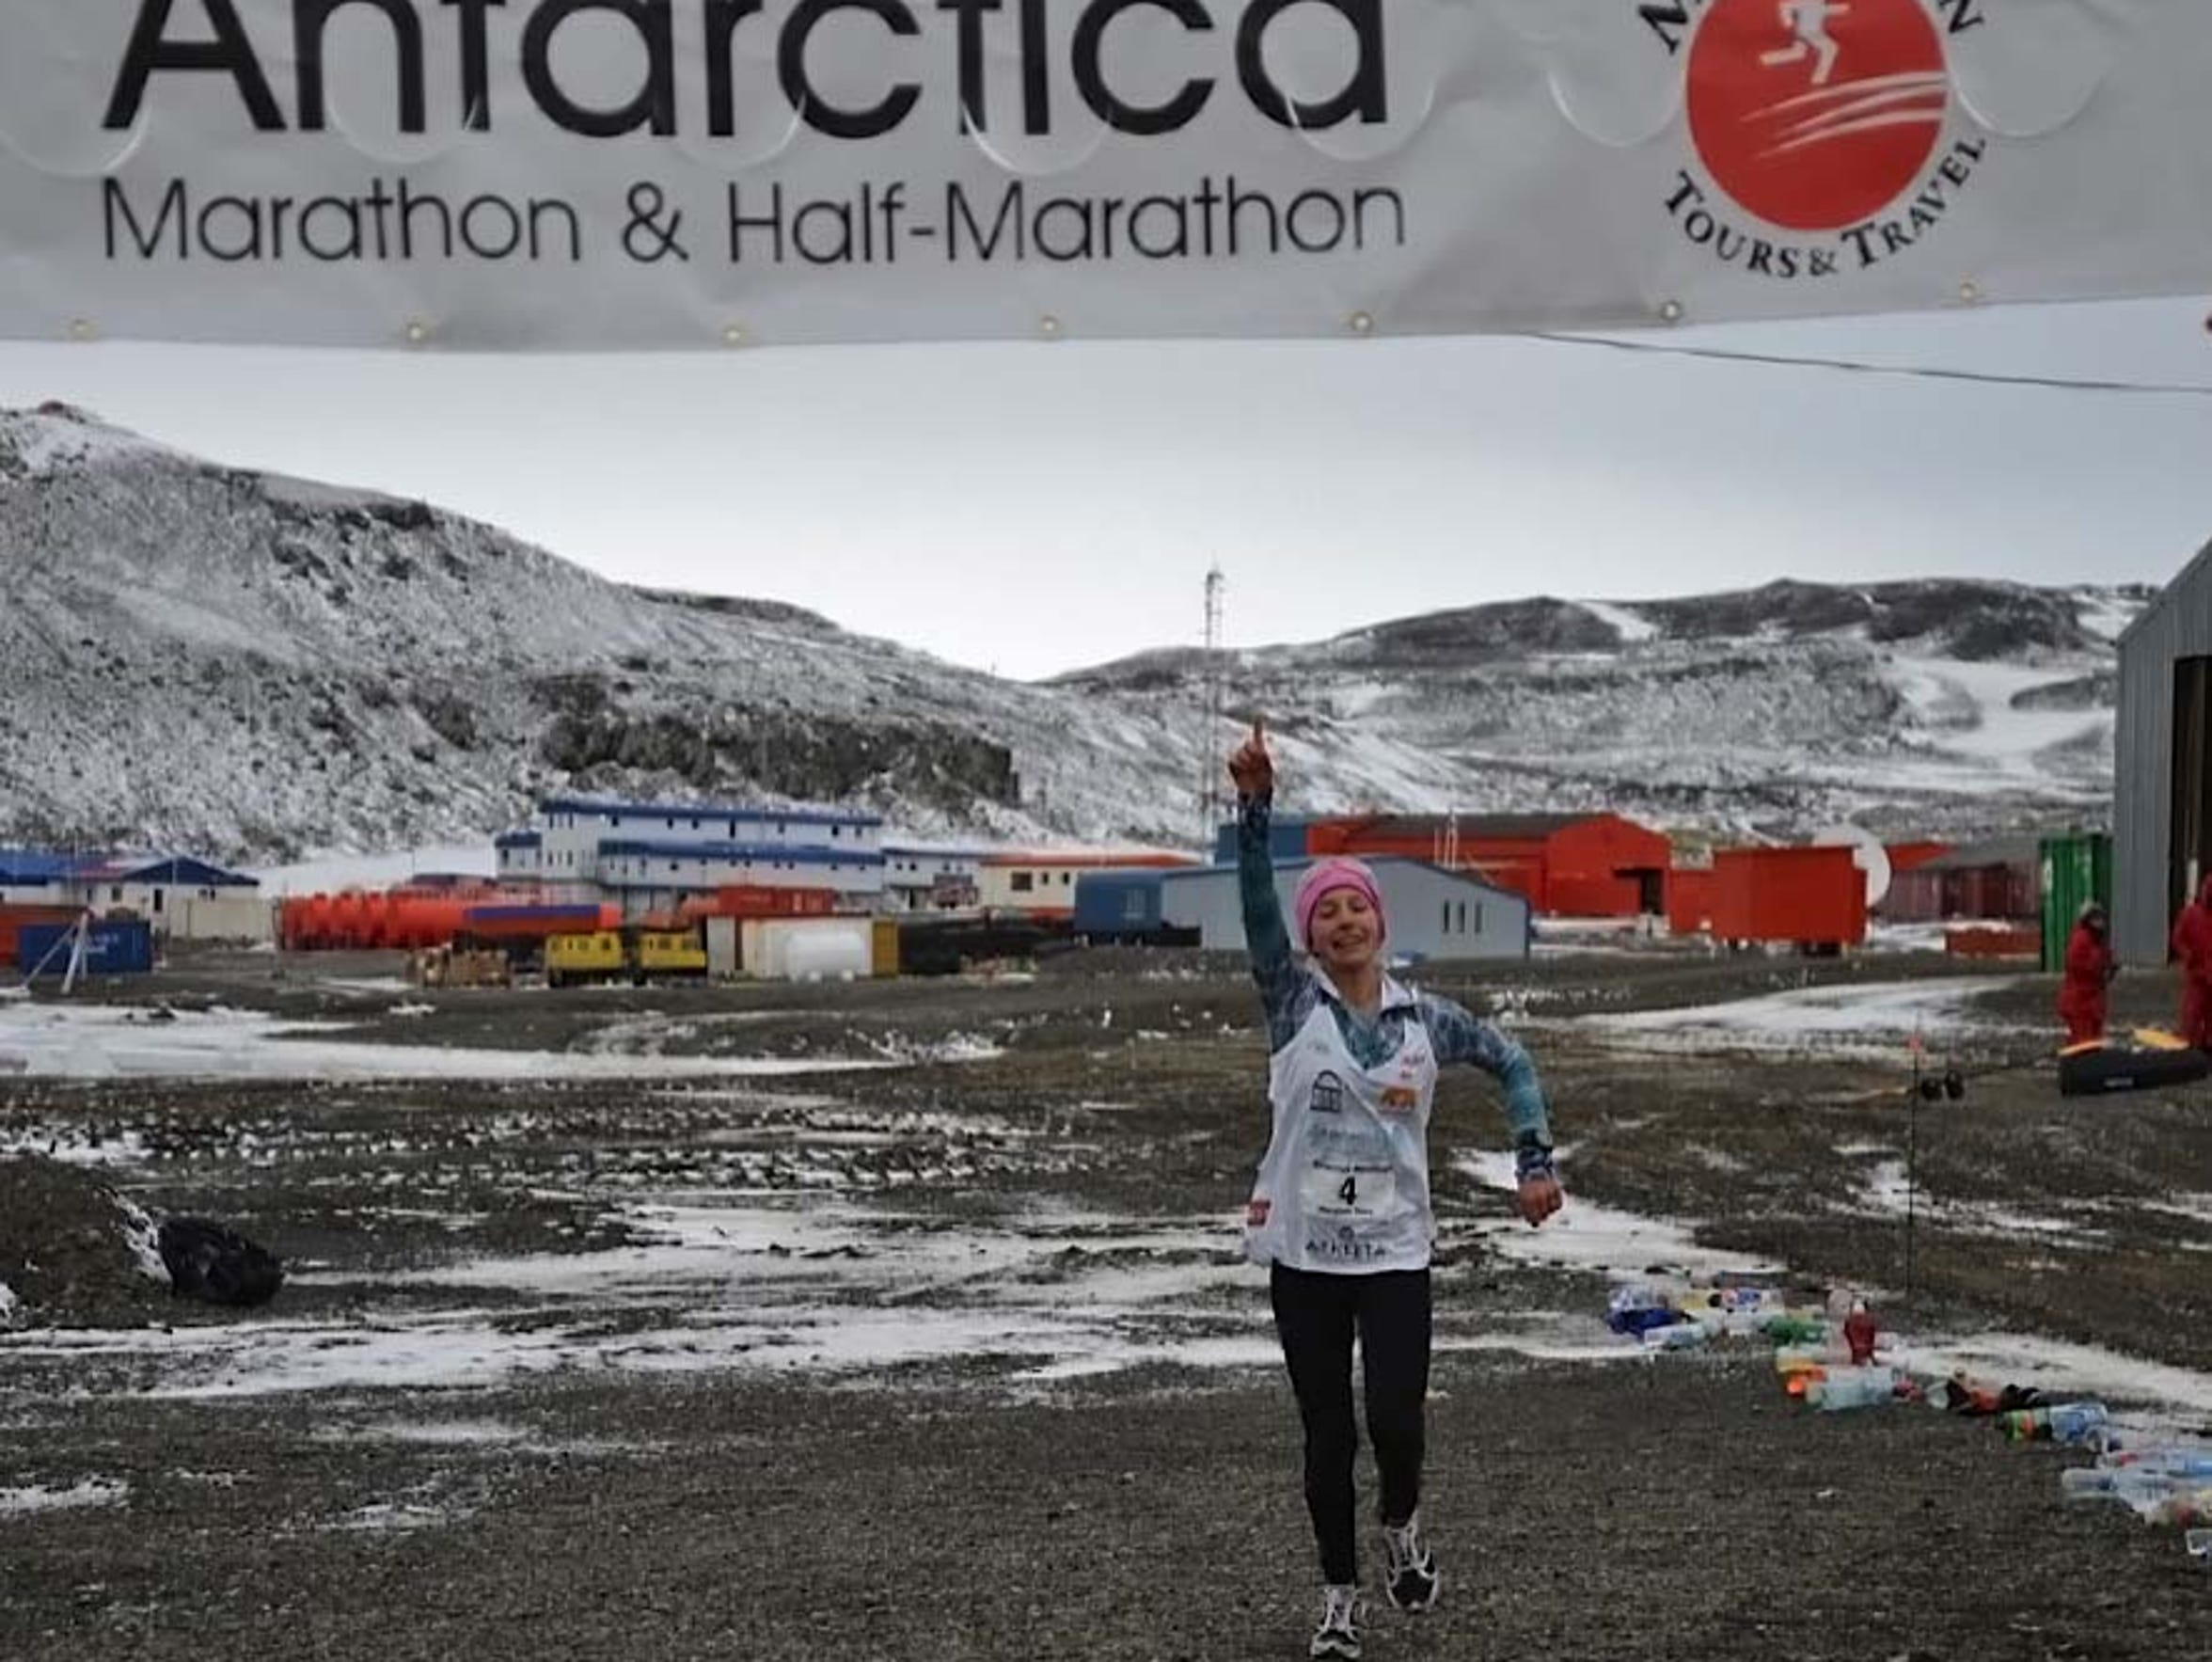 Winter Vinecki takes part in the Antarctica Marathon